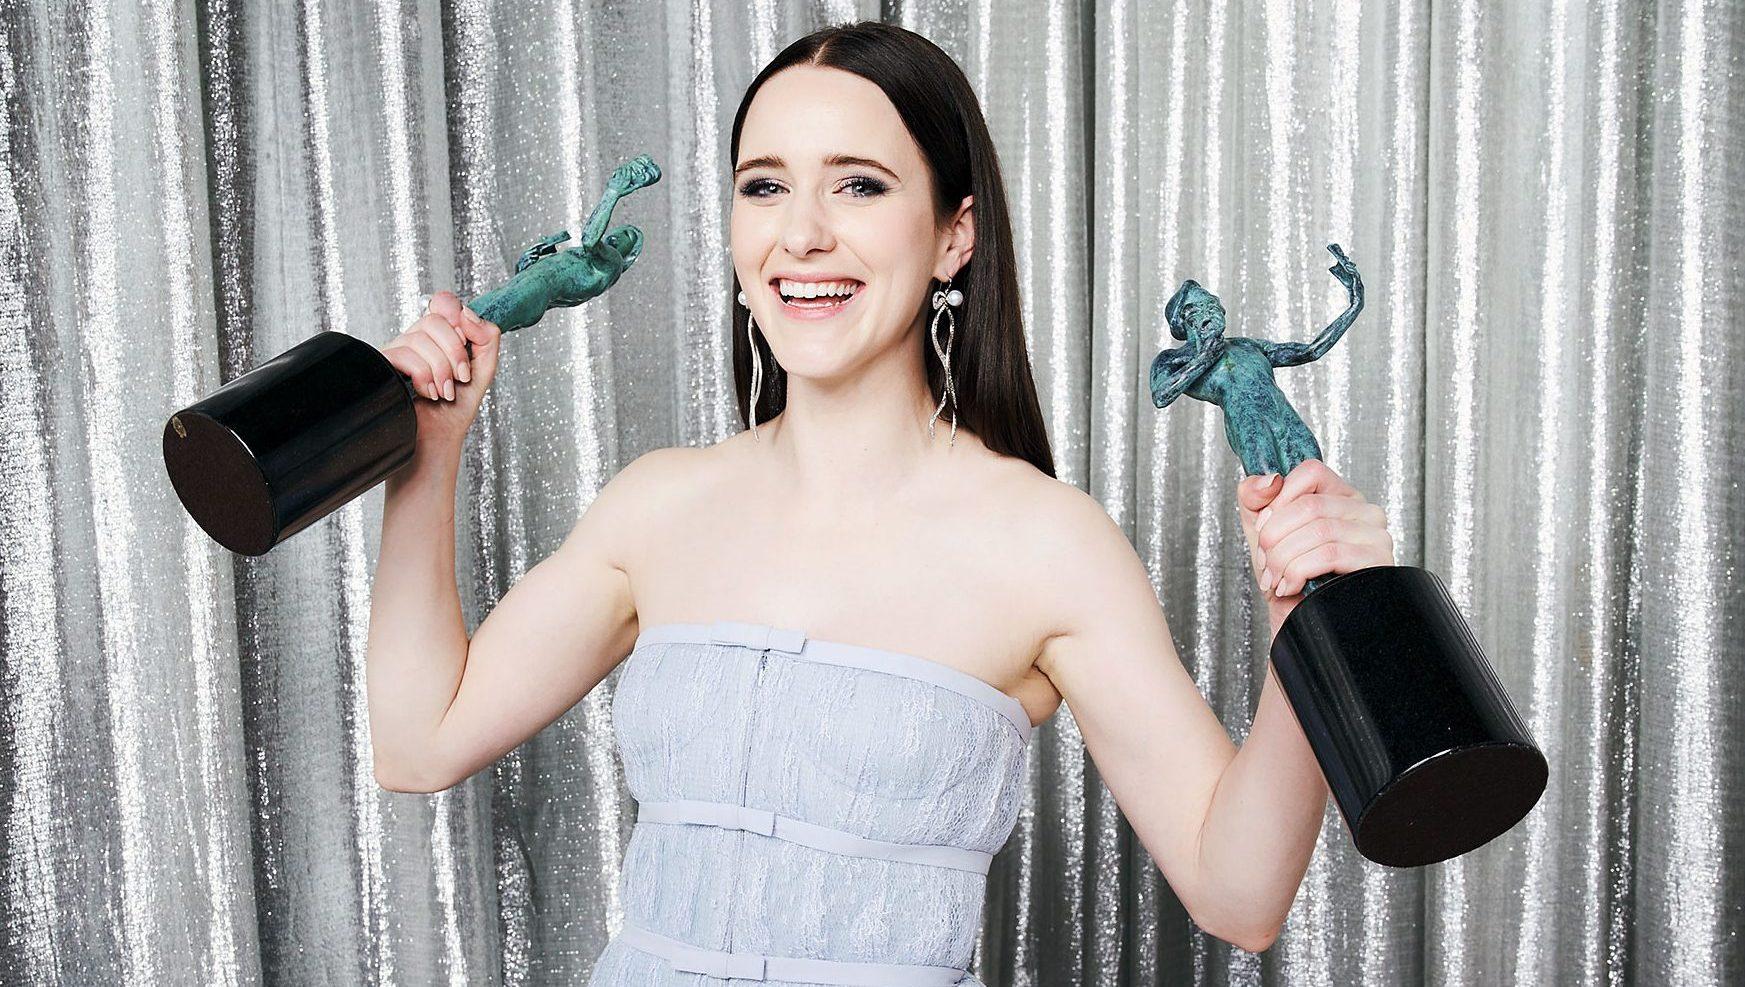 Rachel Brosnahan SAG Awards 21019